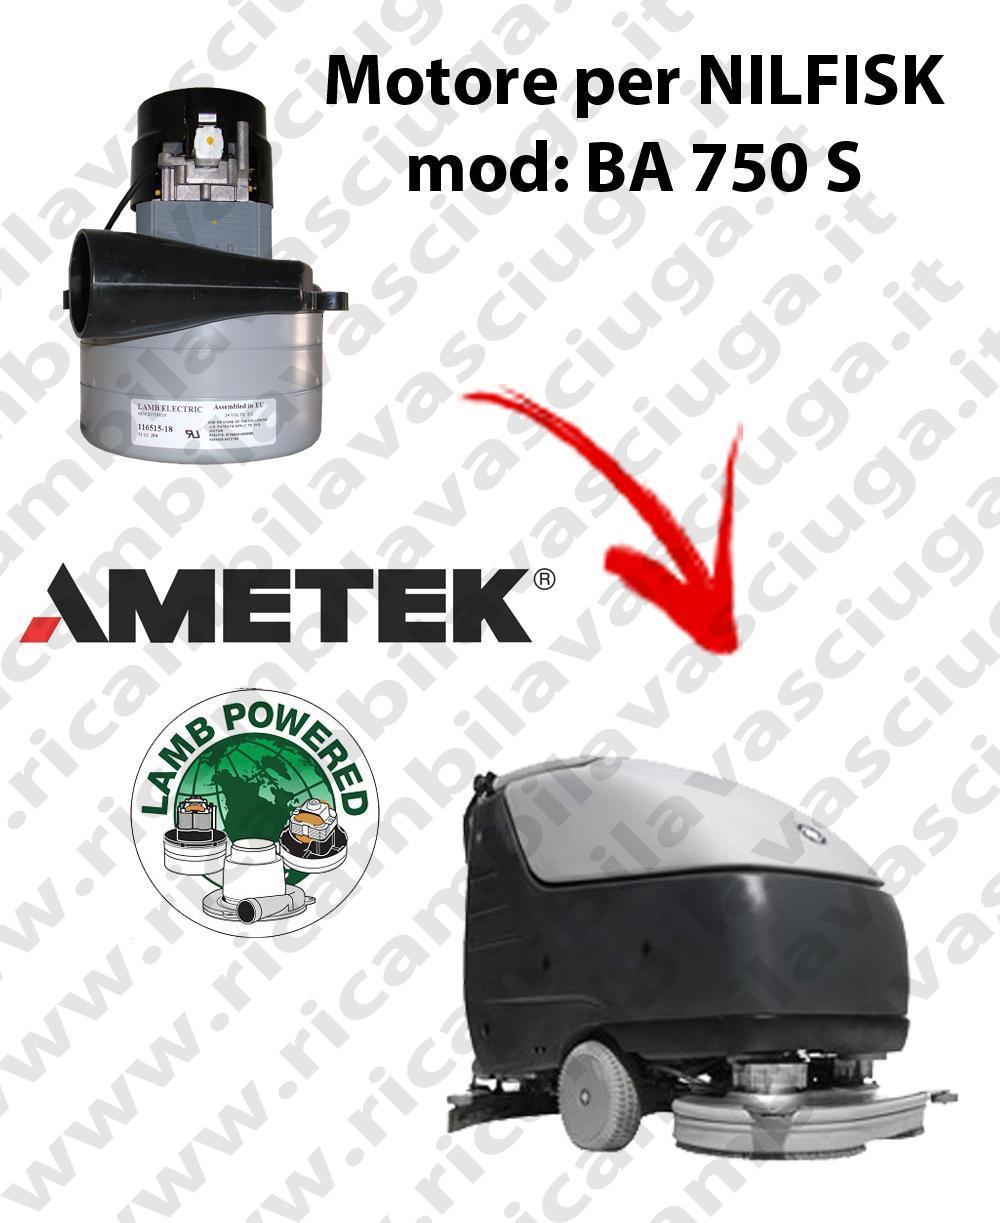 BA 750 S Vacuum motor LAMB AMETEK for scrubber dryer NILFISK